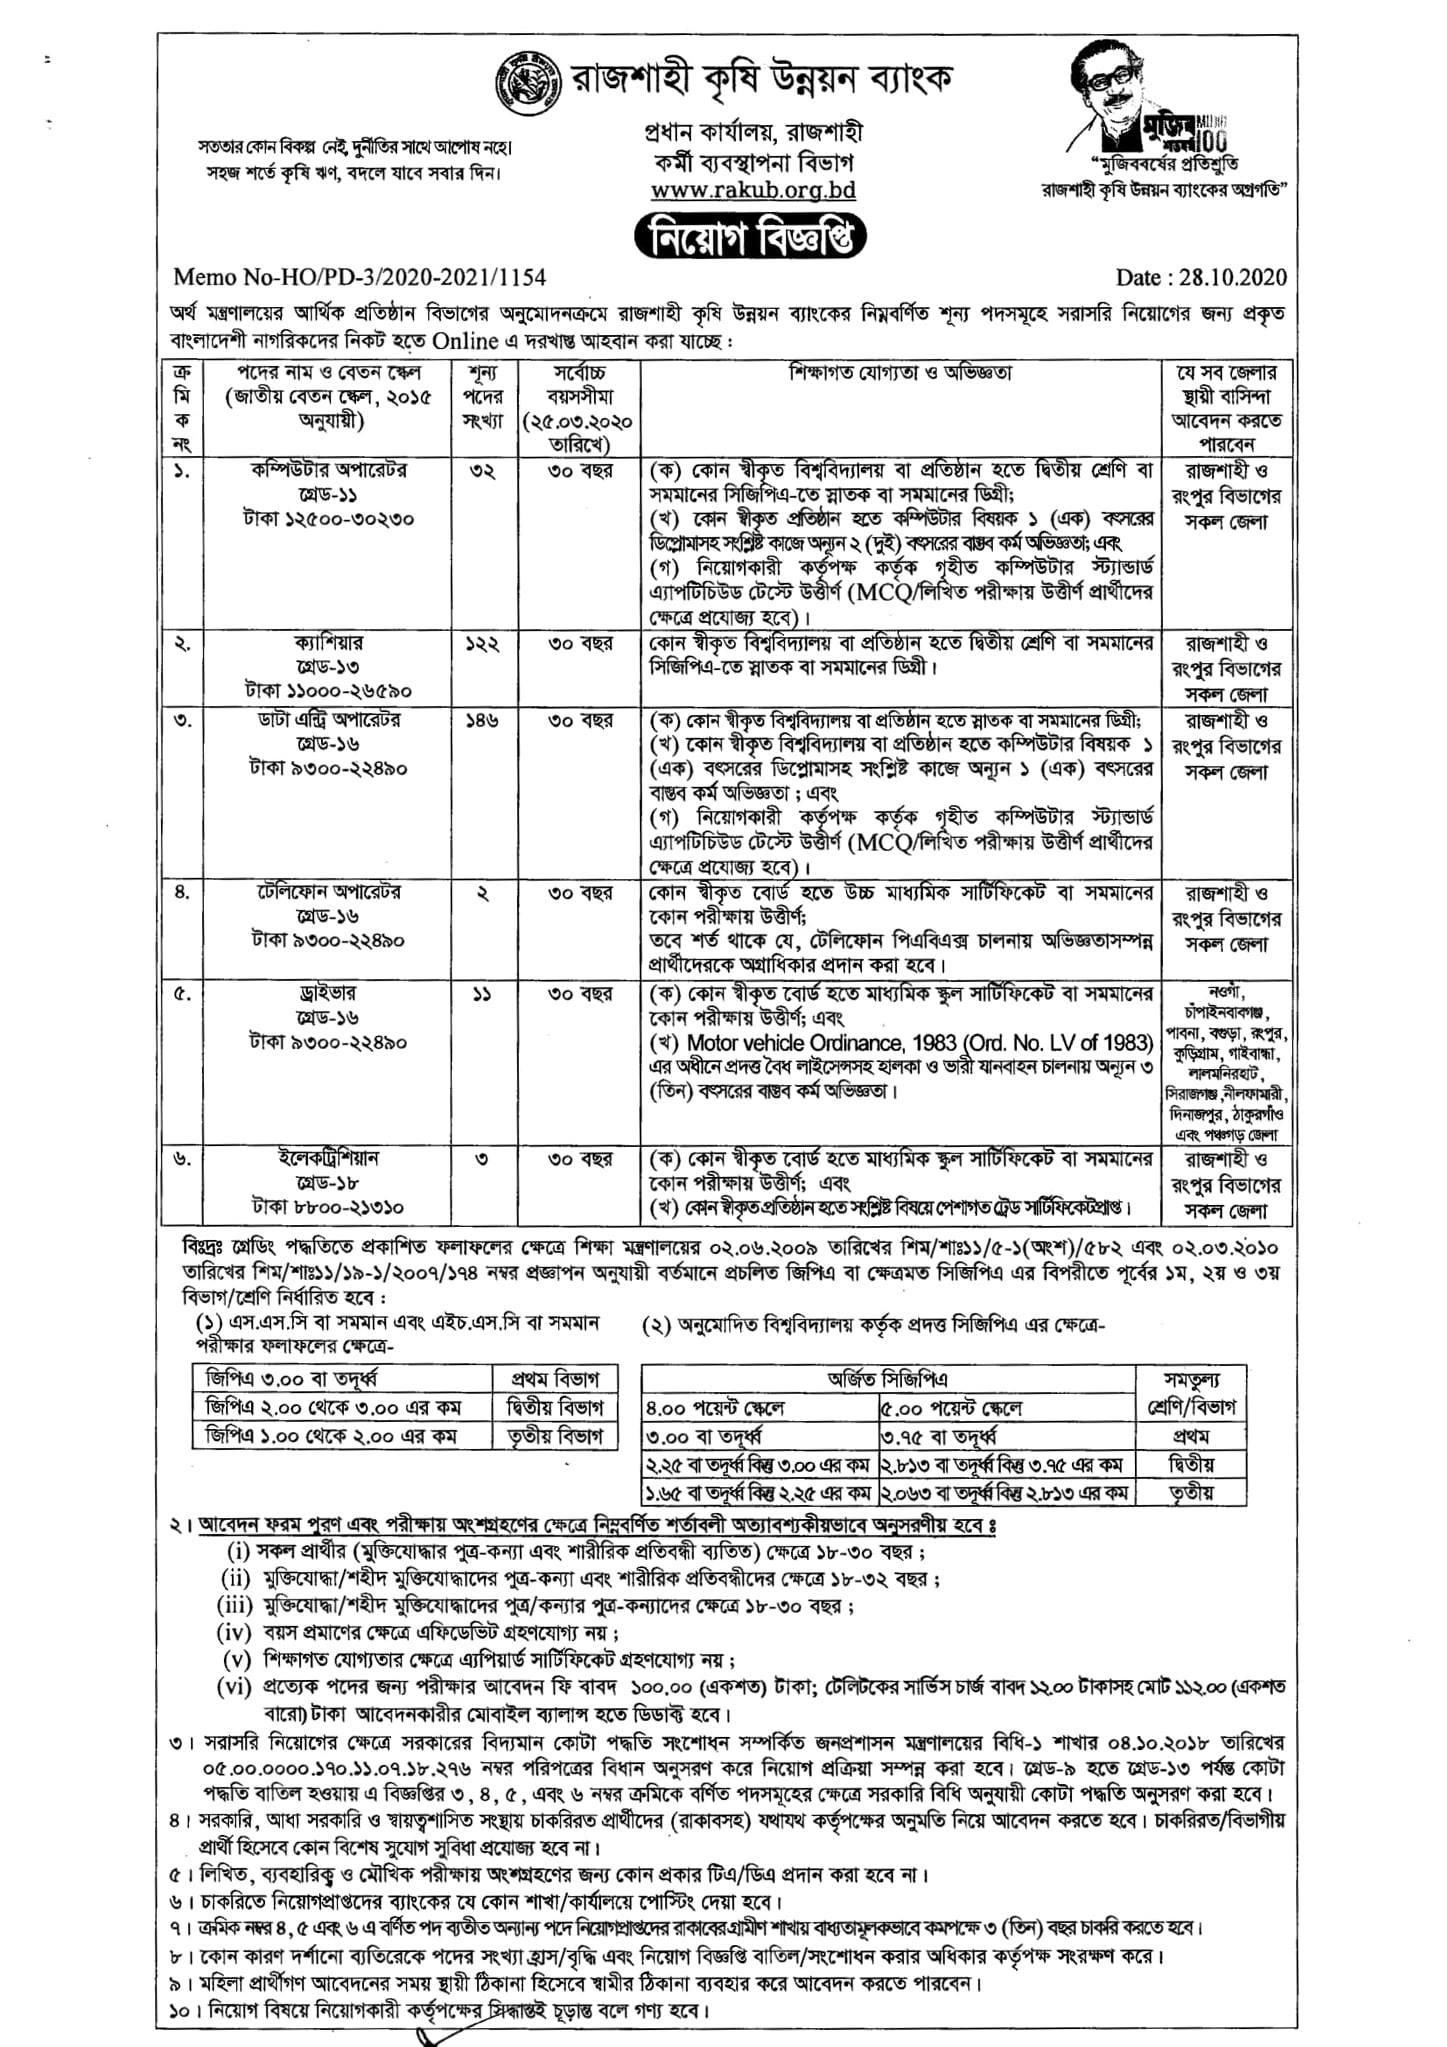 Rajshahi-Krishi-Unnayan-Bank-job-circular-2020-learninghomebd-01